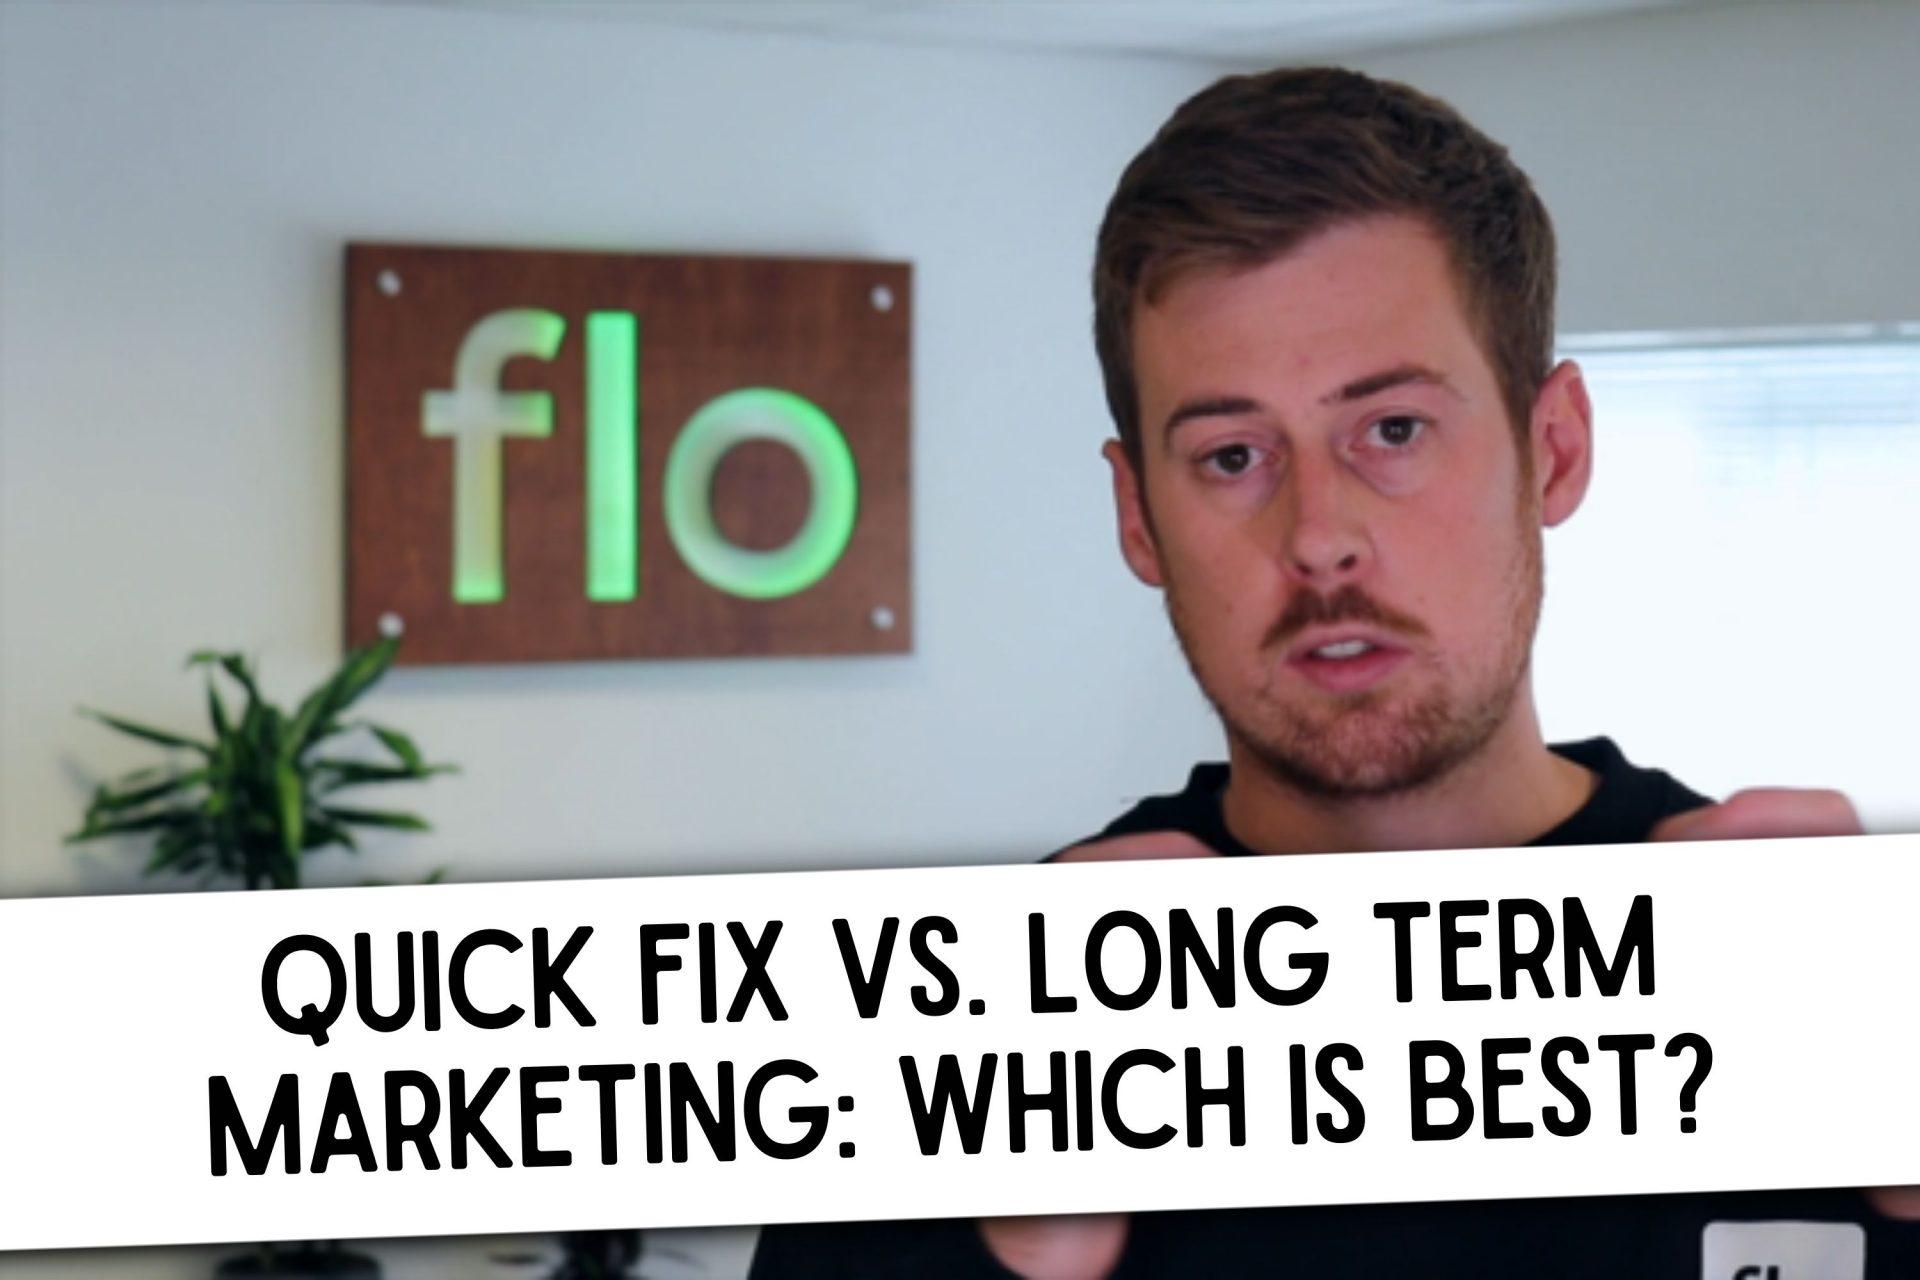 Quick fix vs long term marketing kitchen business